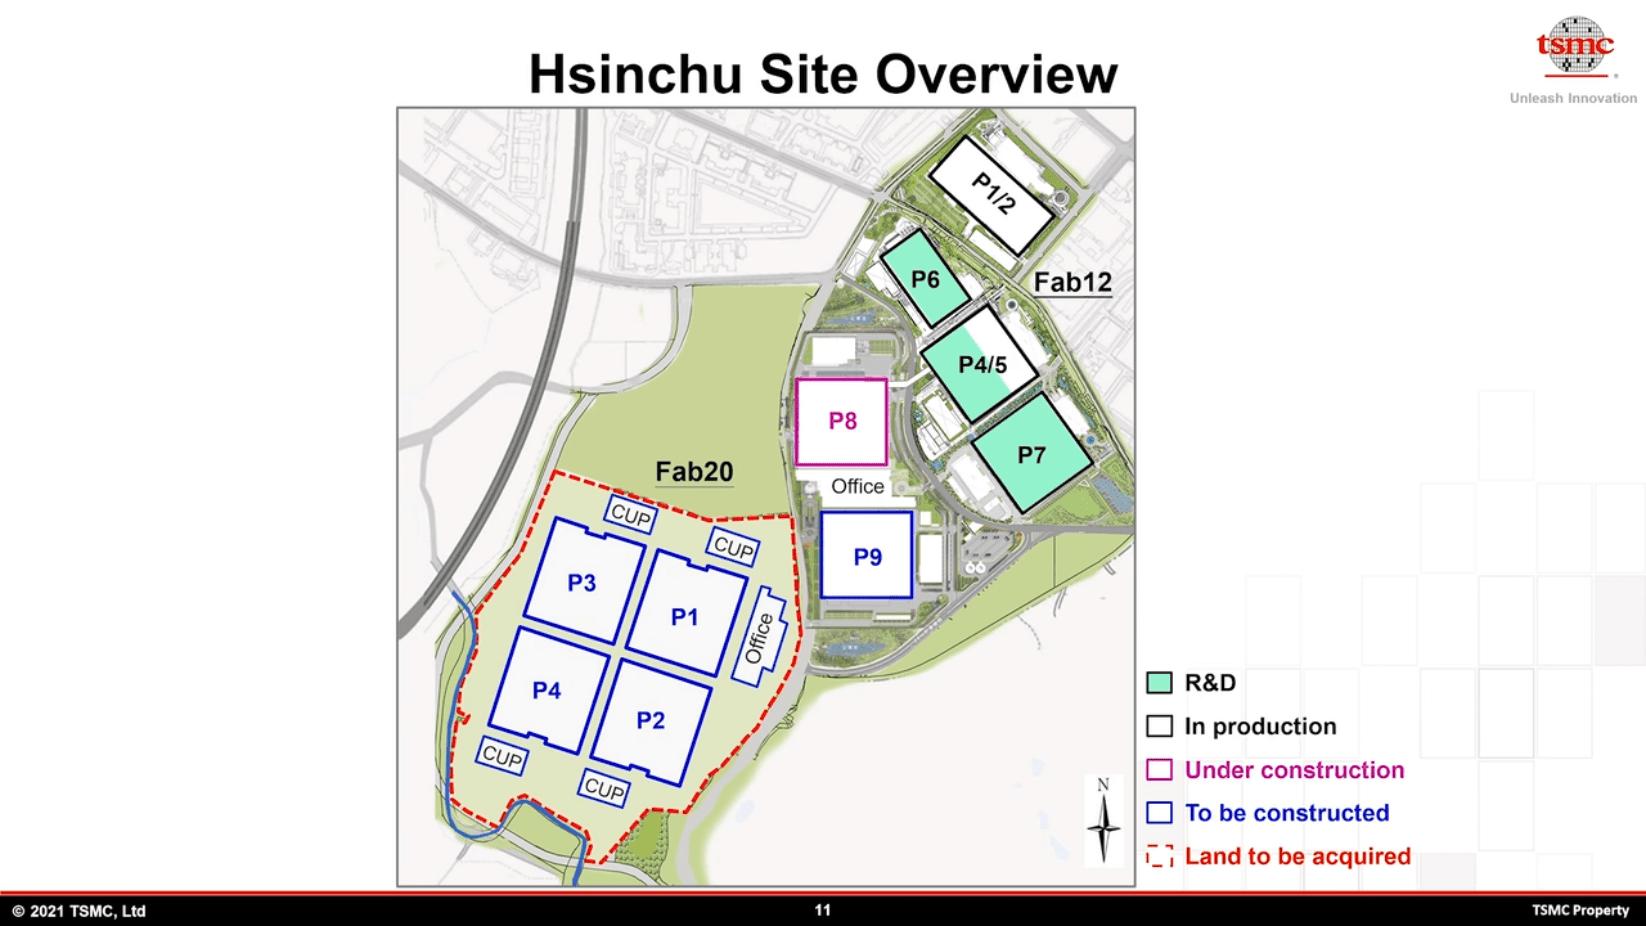 TSMC in Hsinchu mit Fab12 und zukünftiger Fab20